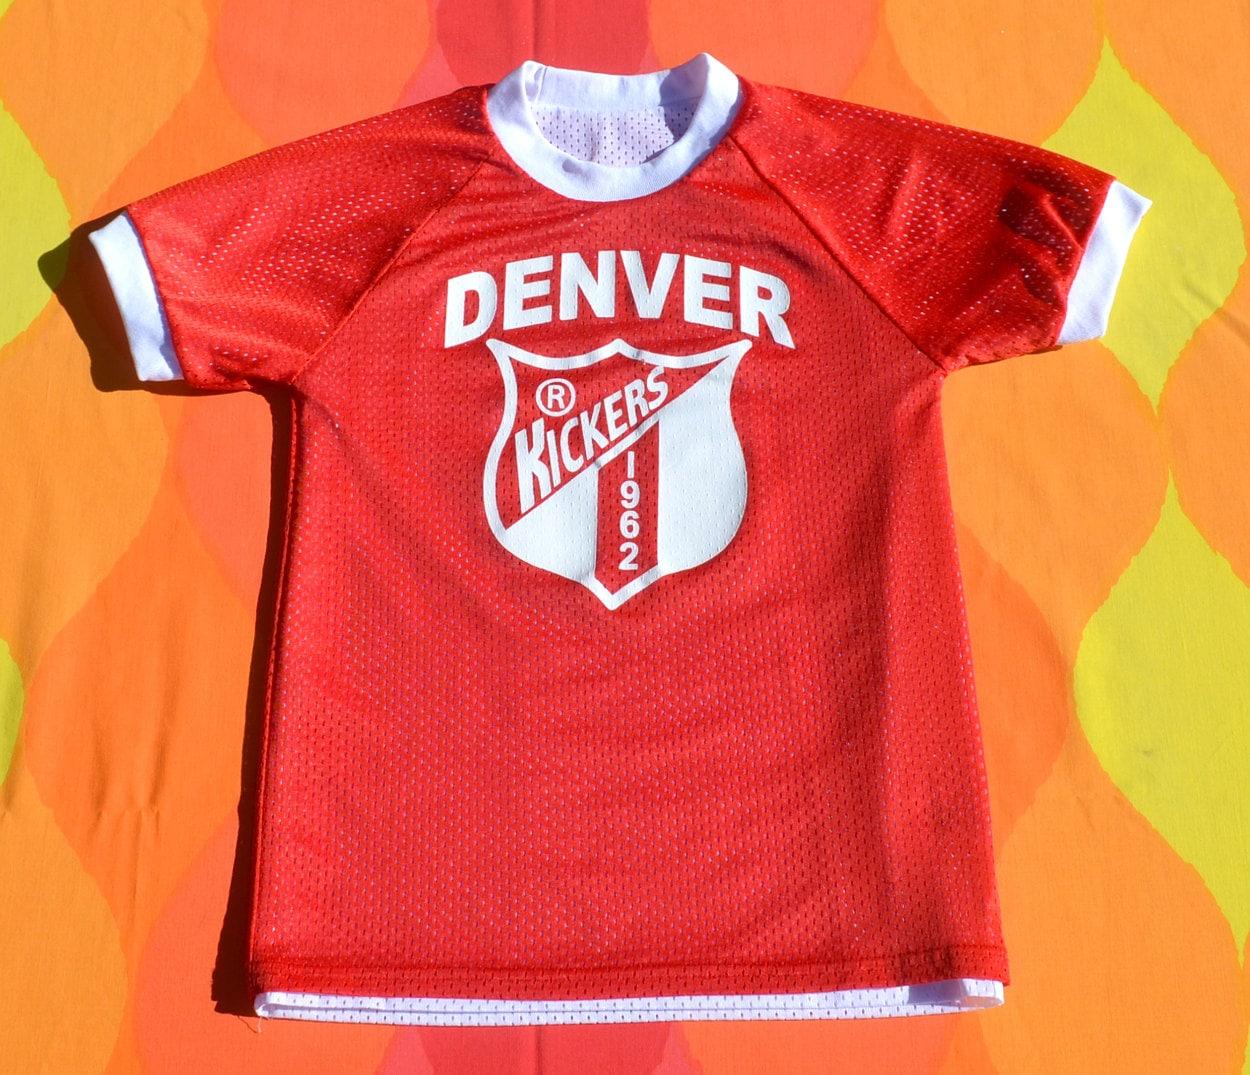 Denver Kickers: Vintage 80s Kid's T-shirt Soccer Jersey DENVER Kickers